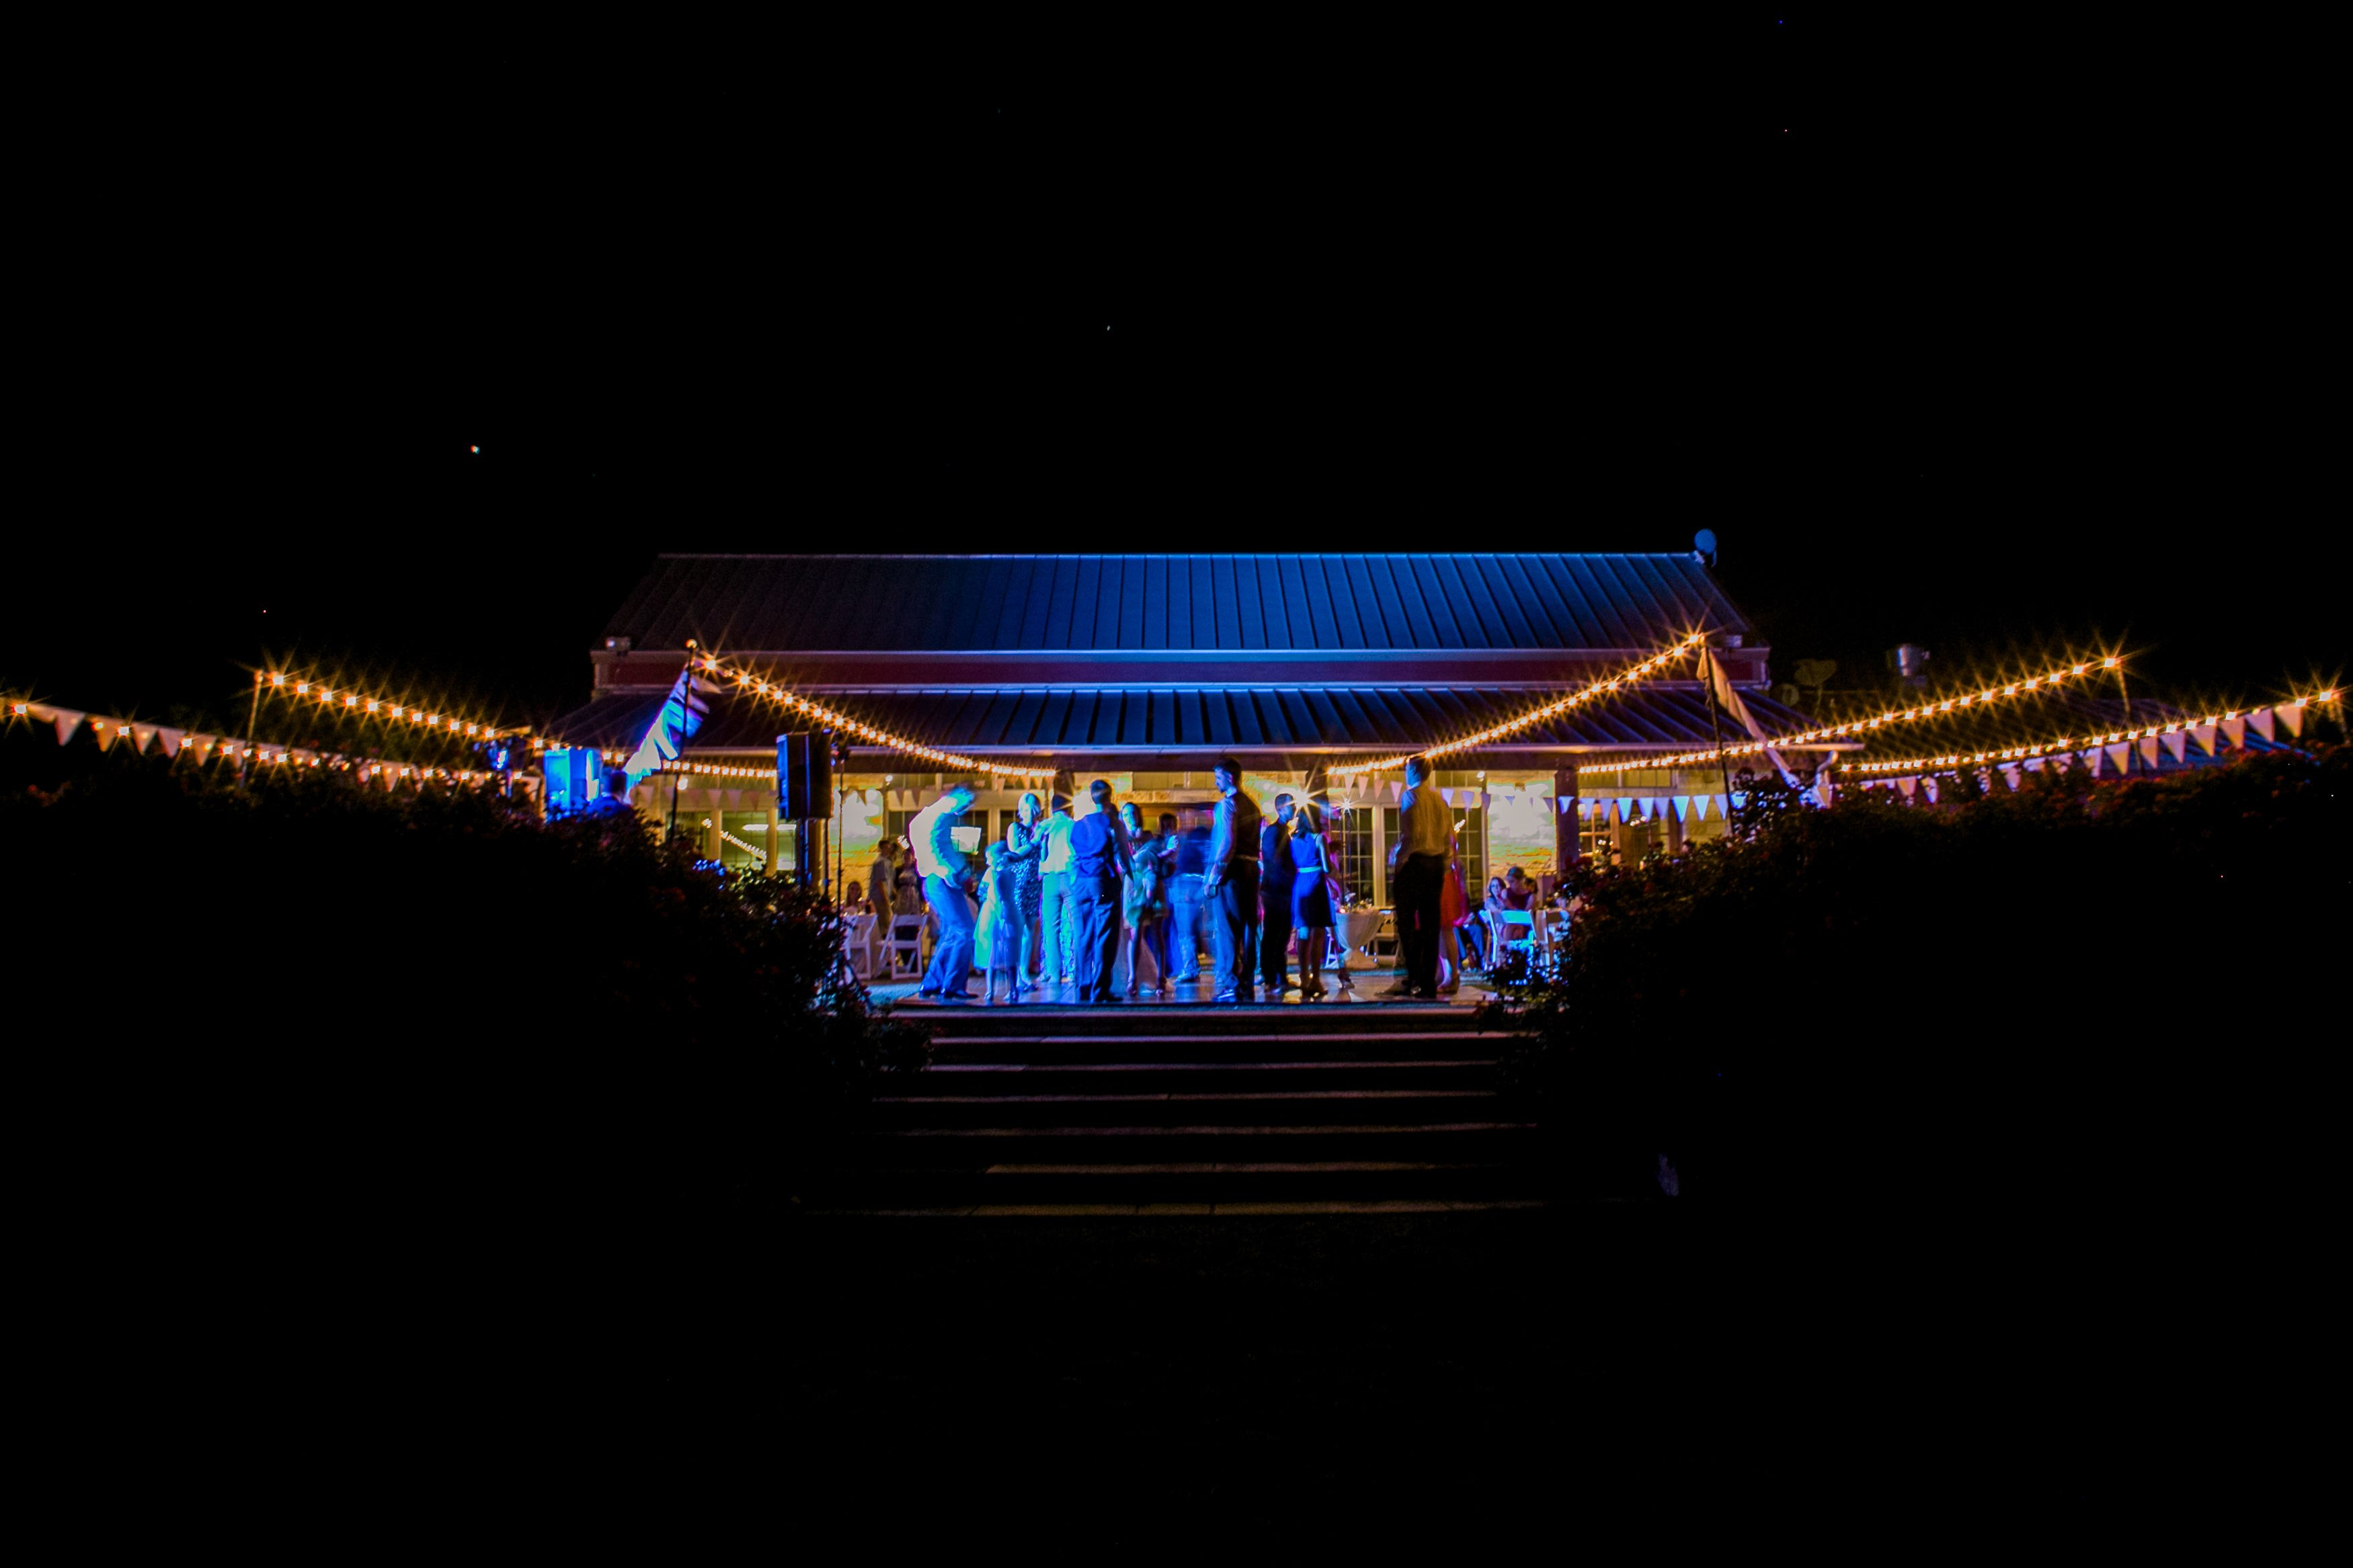 Wedding venue Bryan/College Station Royalty Pecan Farms